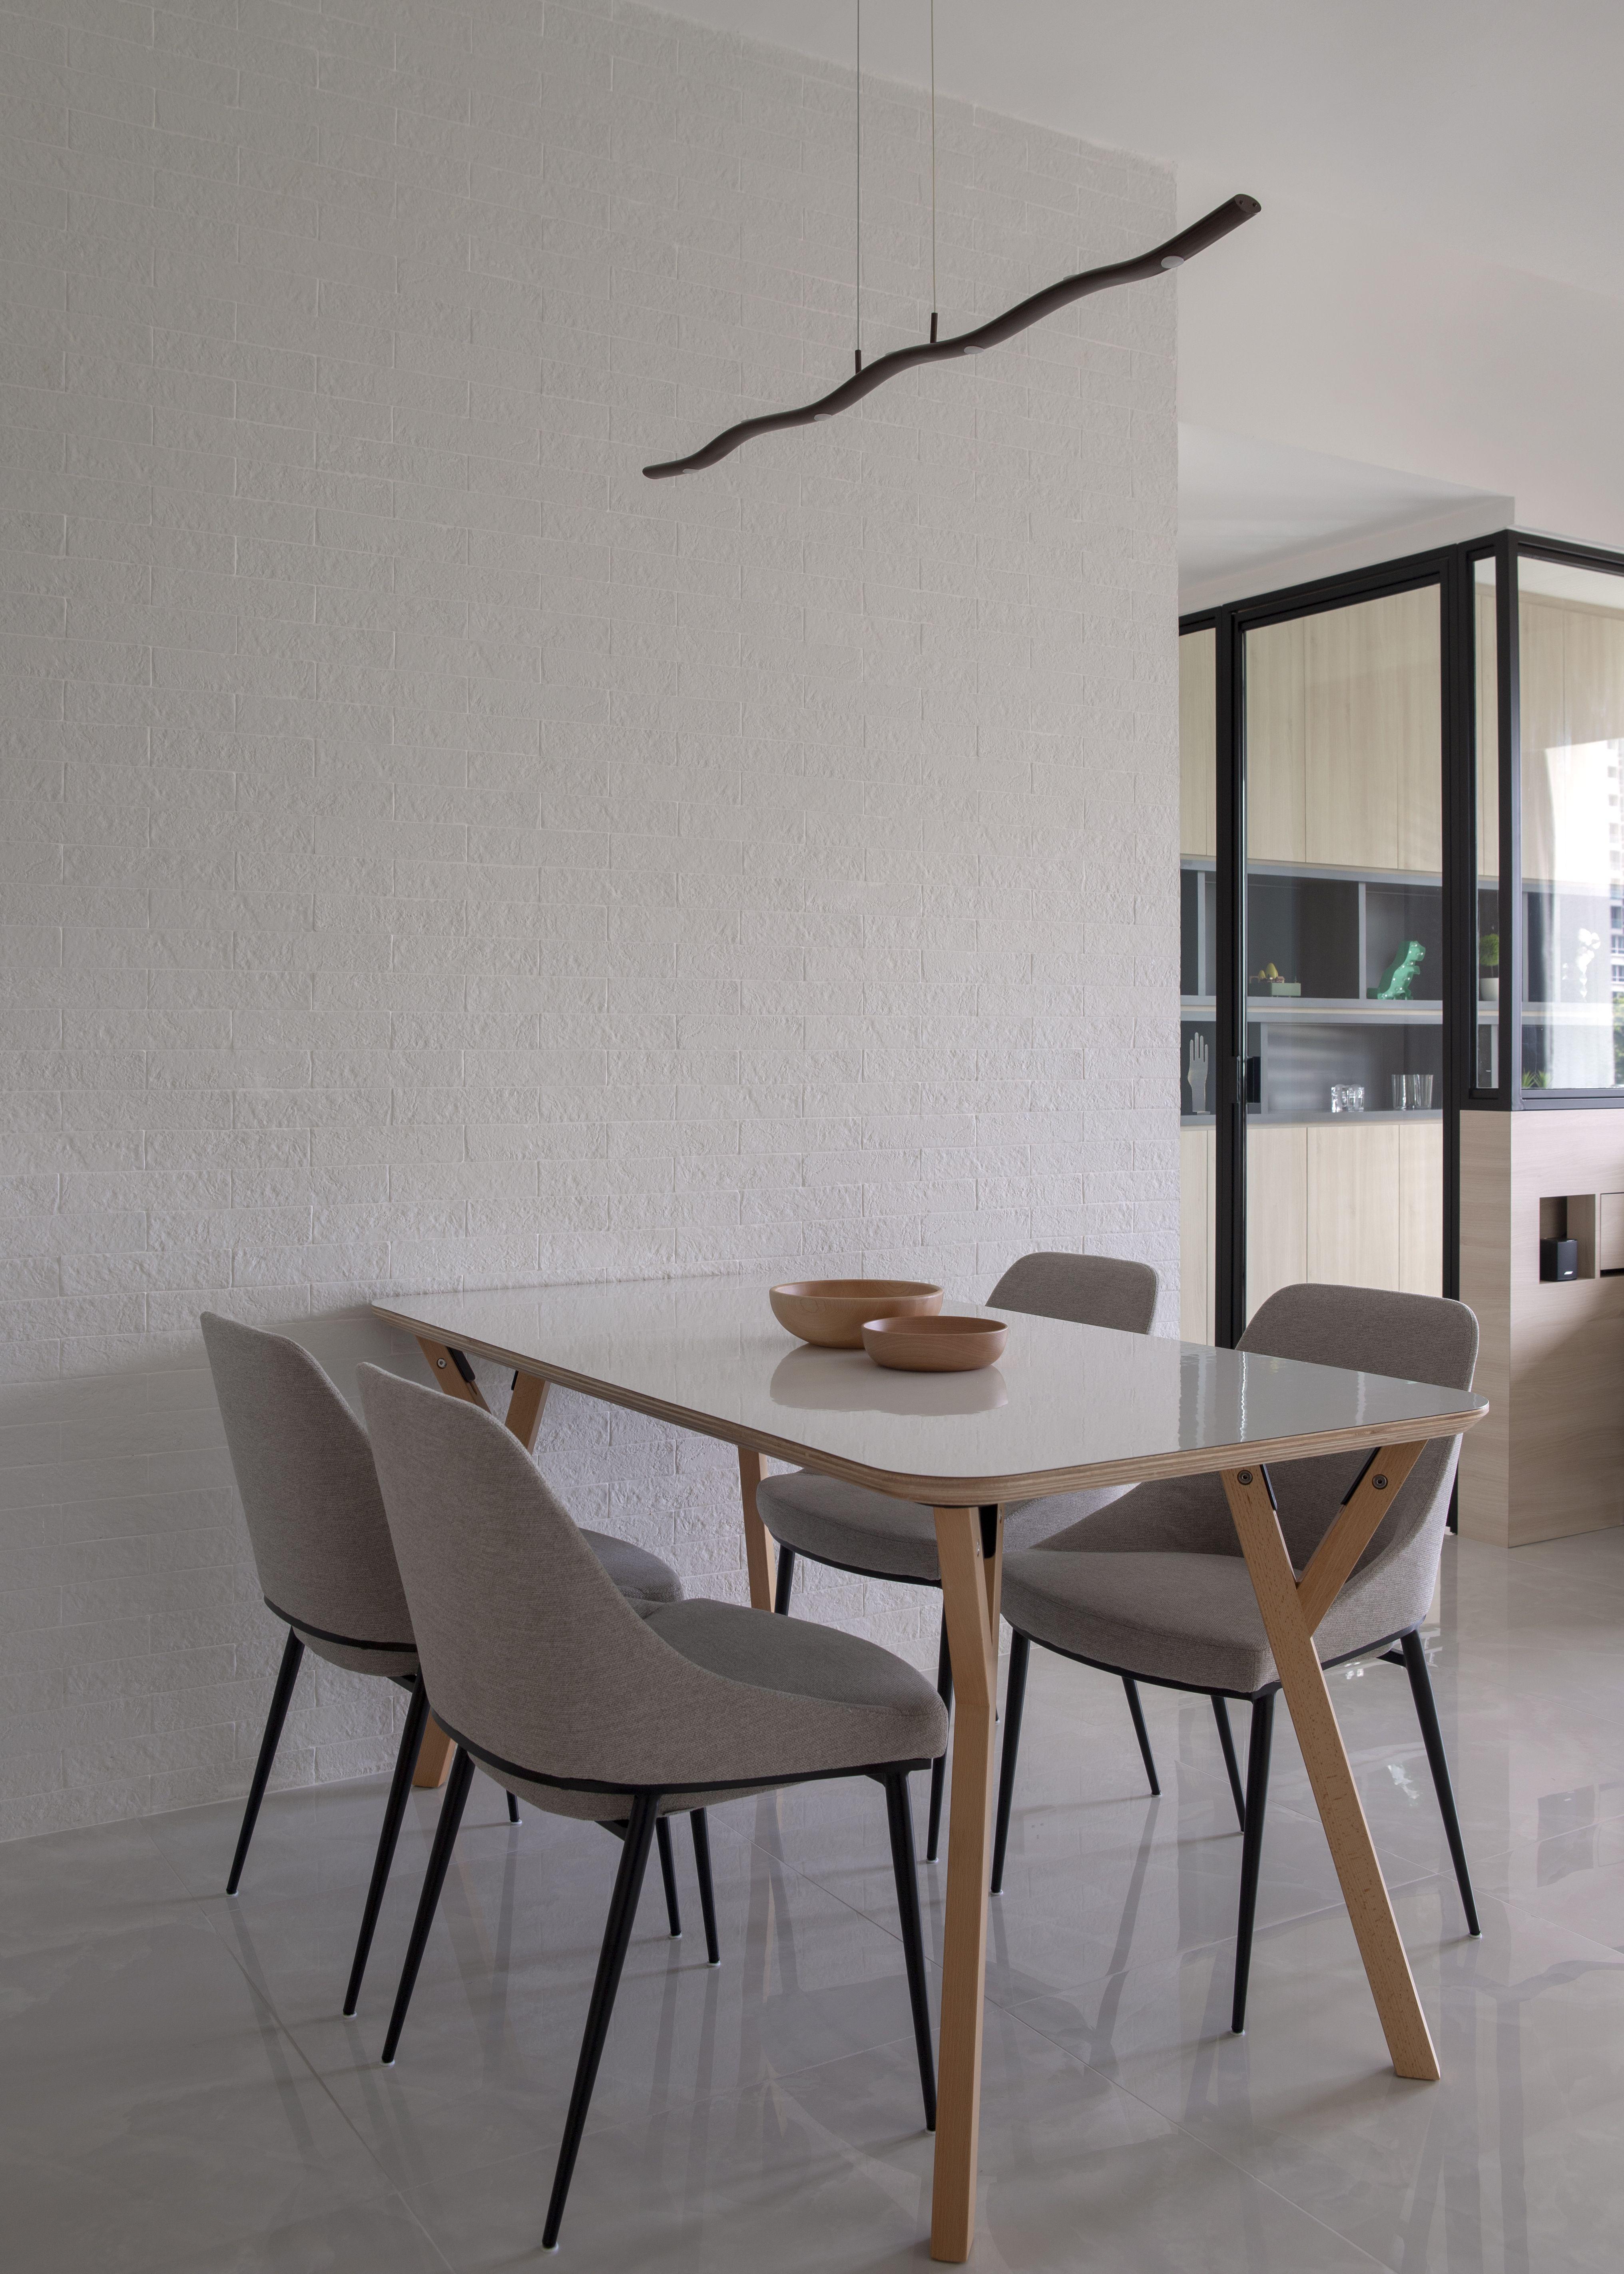 Carpenters Interior Design Scandinavian Resale Condominium Singapore Interior Design Singapore Interior Home Decor